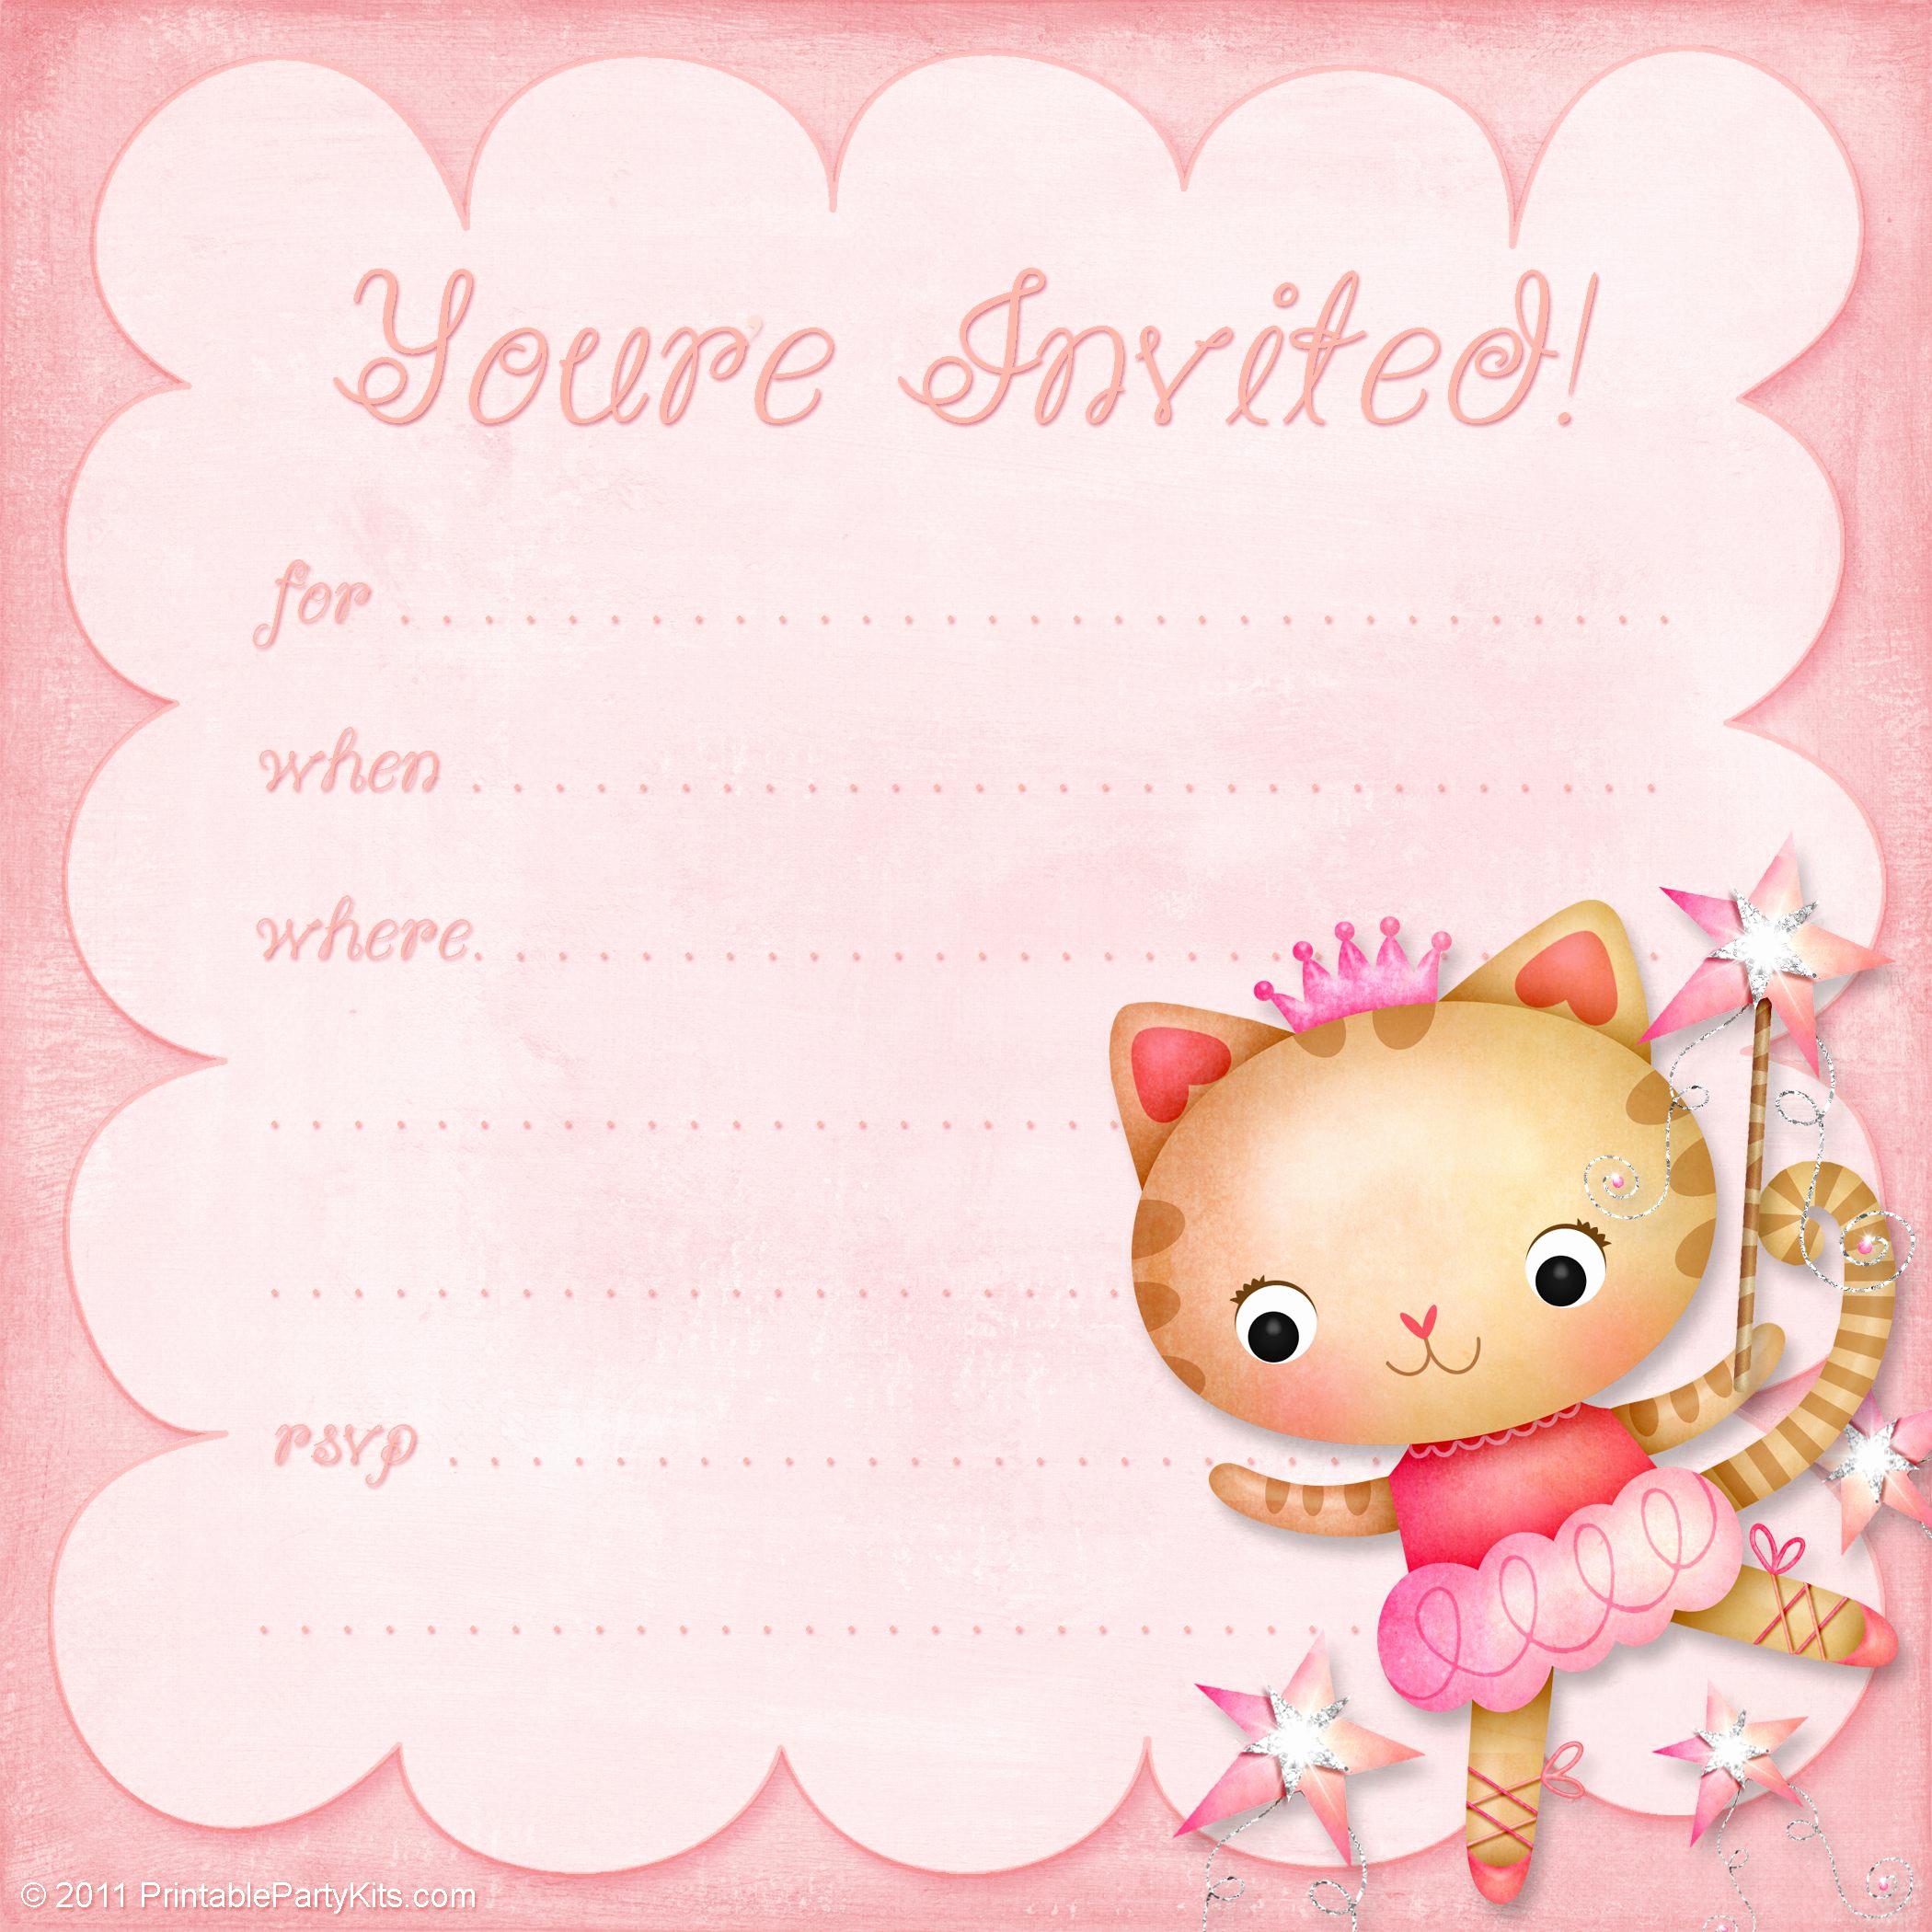 Invitation Template Google Docs Luxury Birthday Party Invitation Template Birthday Party